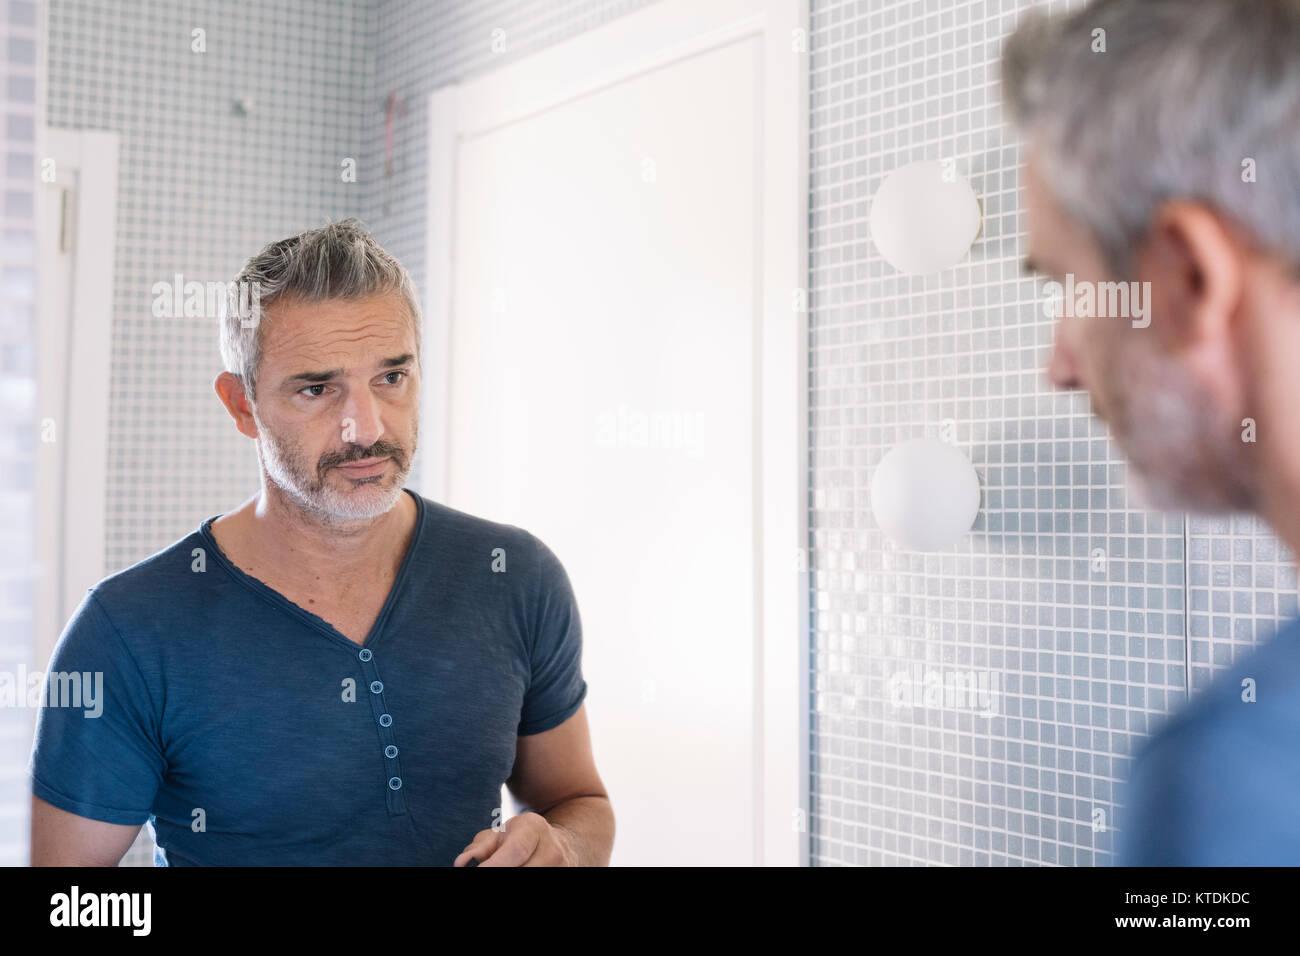 mature man looking in bathroom mirror stock photo 169945704 alamy